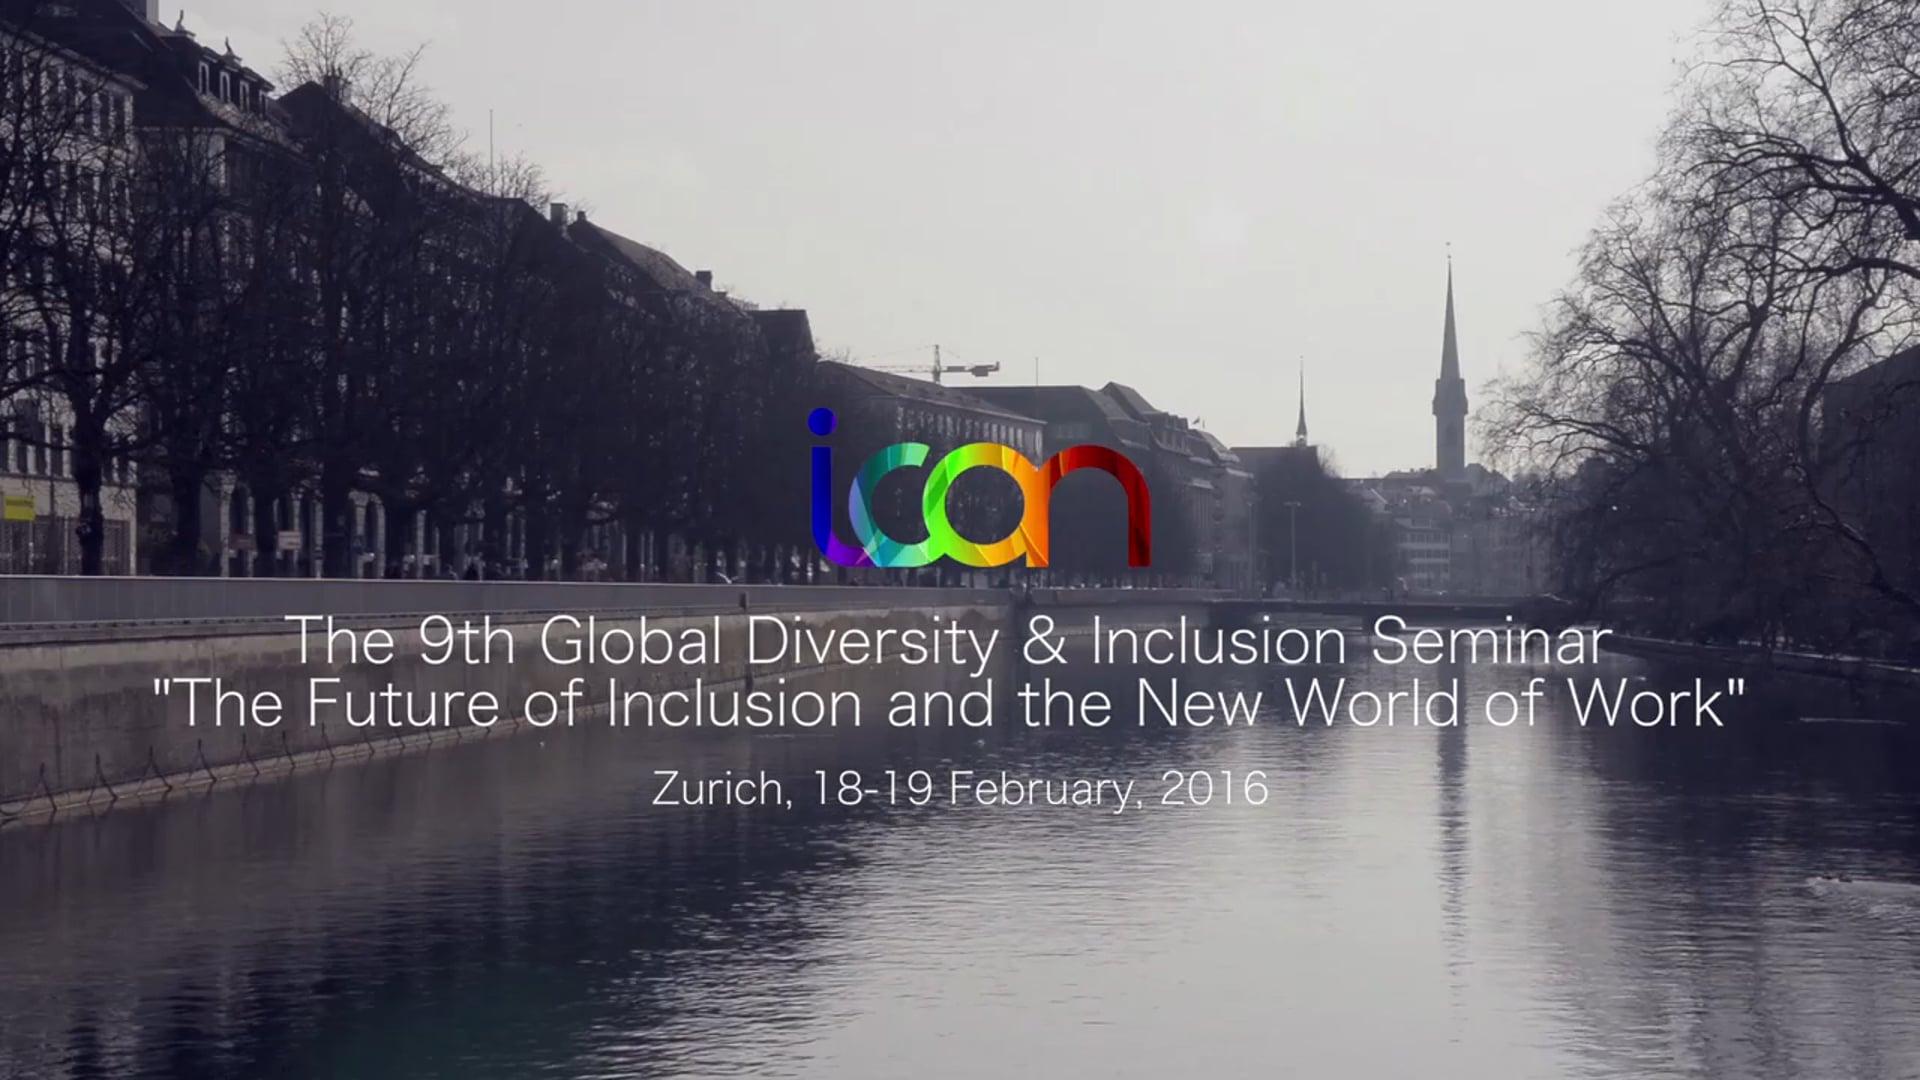 ICON Diversity & Inclusion Seminar, 2016